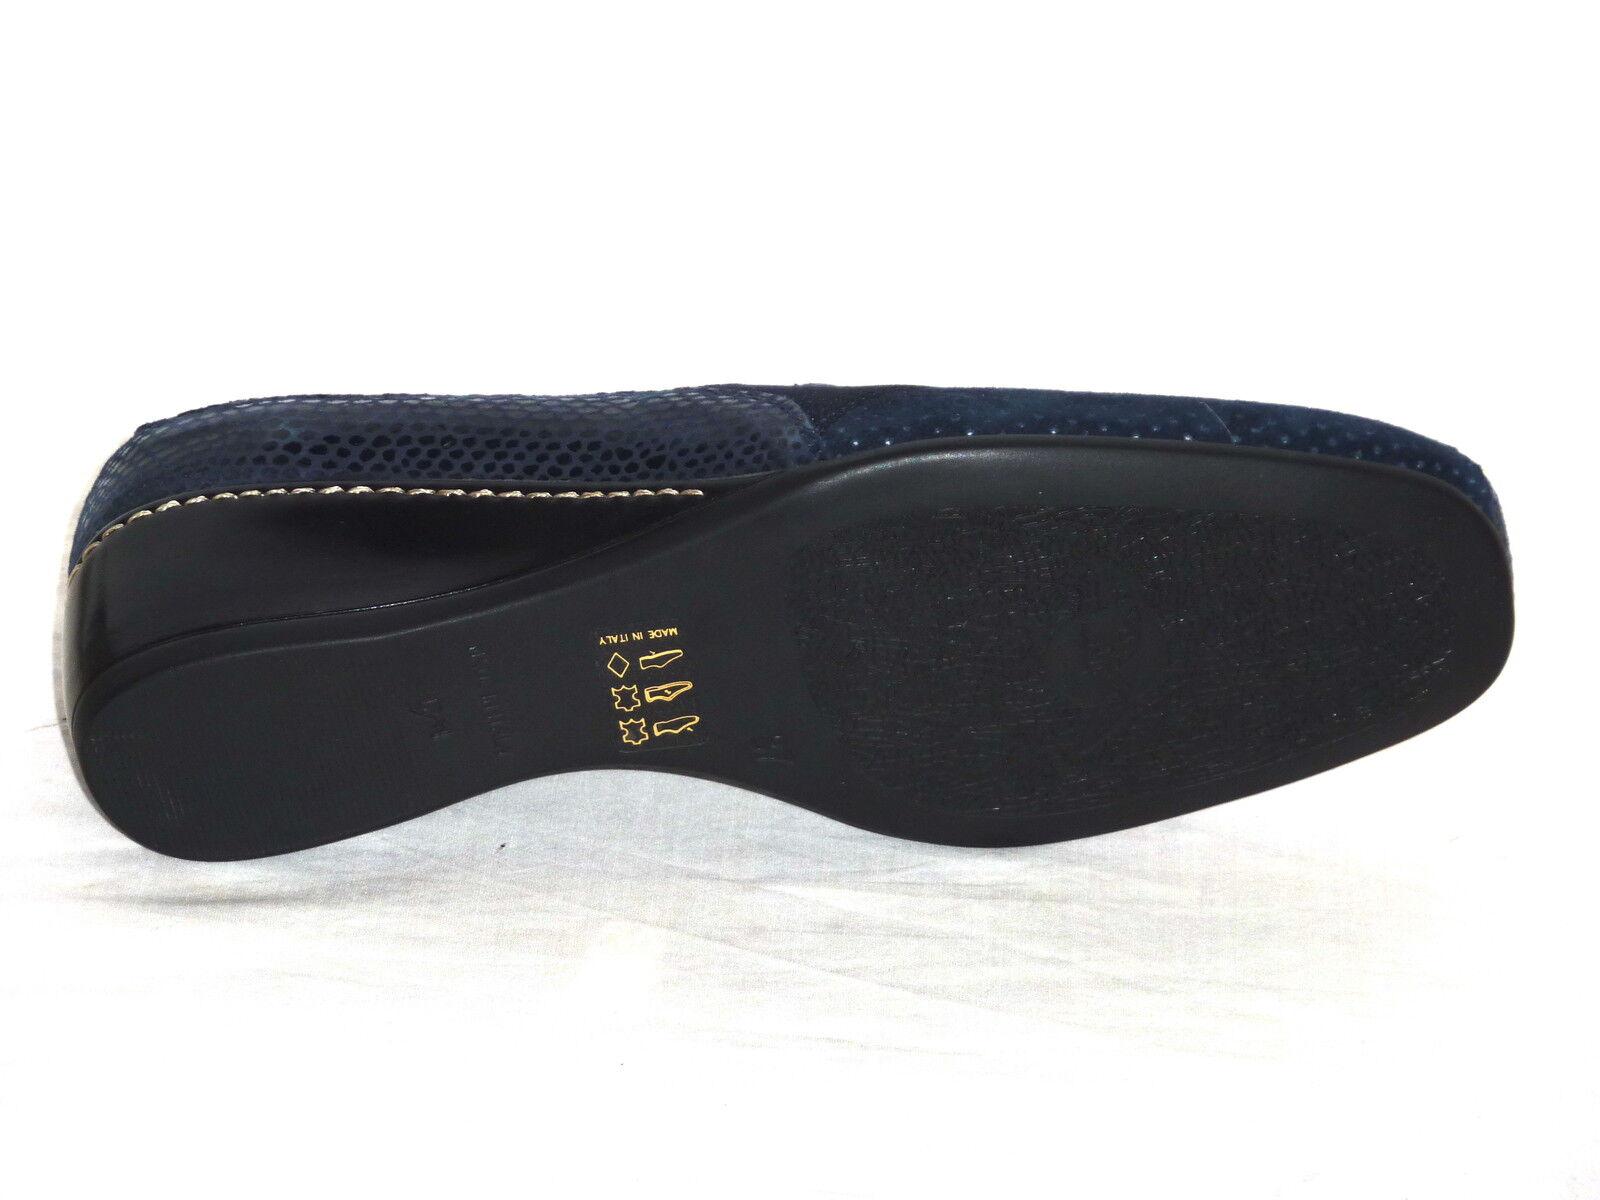 Schuhe Damens ELEGANTI MORBIDE CONFORT PELLE NABUK n. TRAFORATE BLU n. NABUK 37 278543